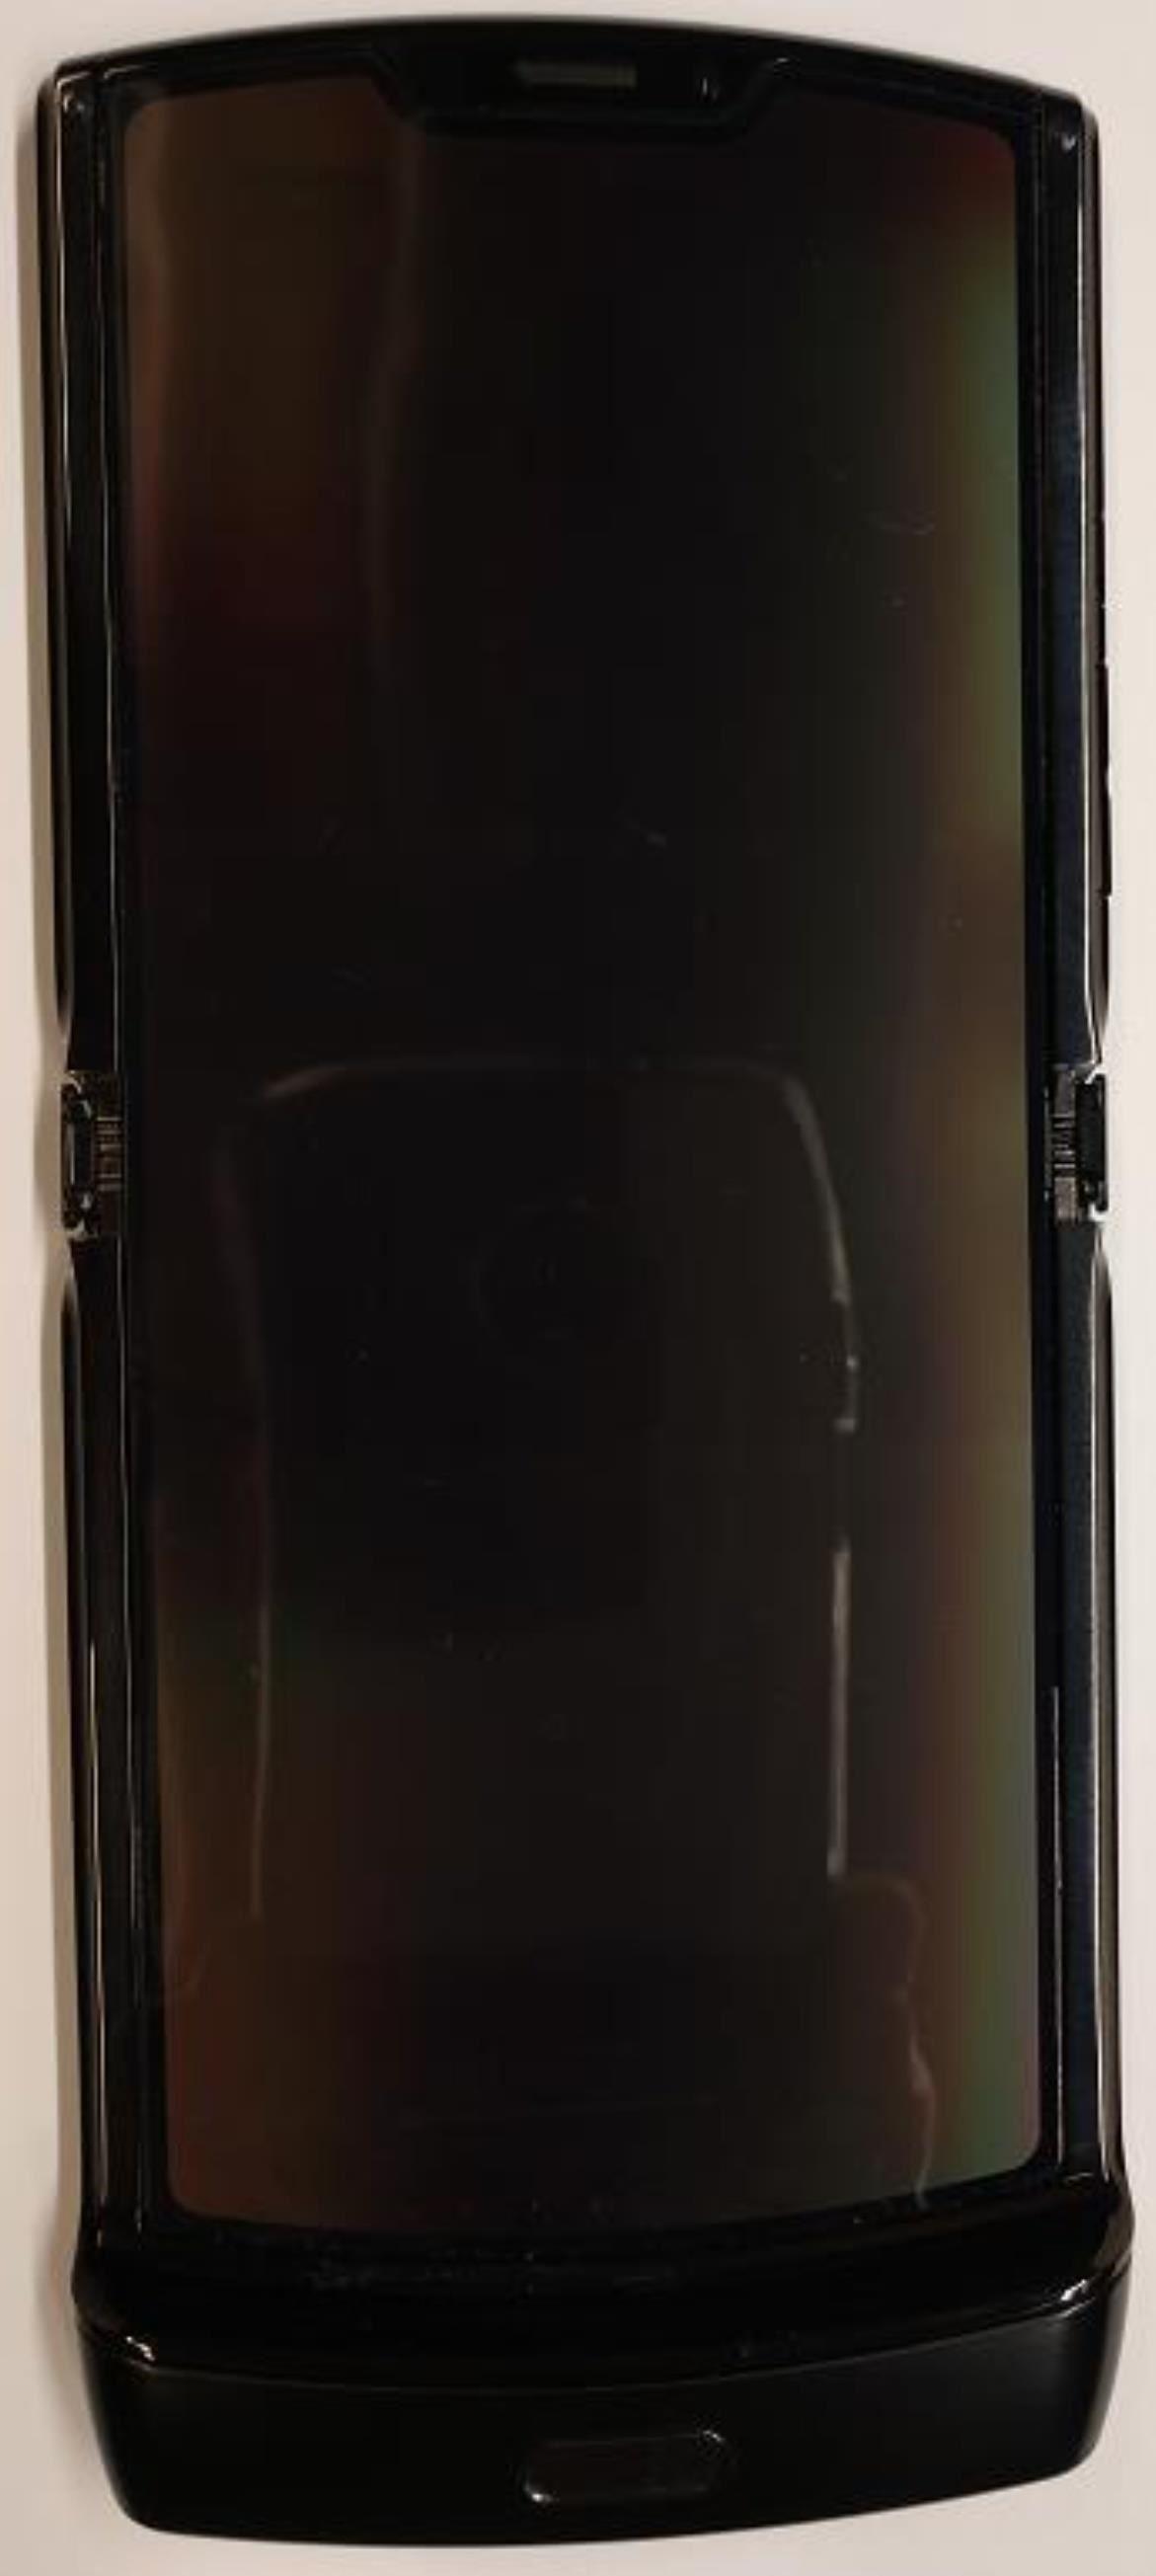 New images of the Motorola RAZR leak of 2019 in the FCC filing